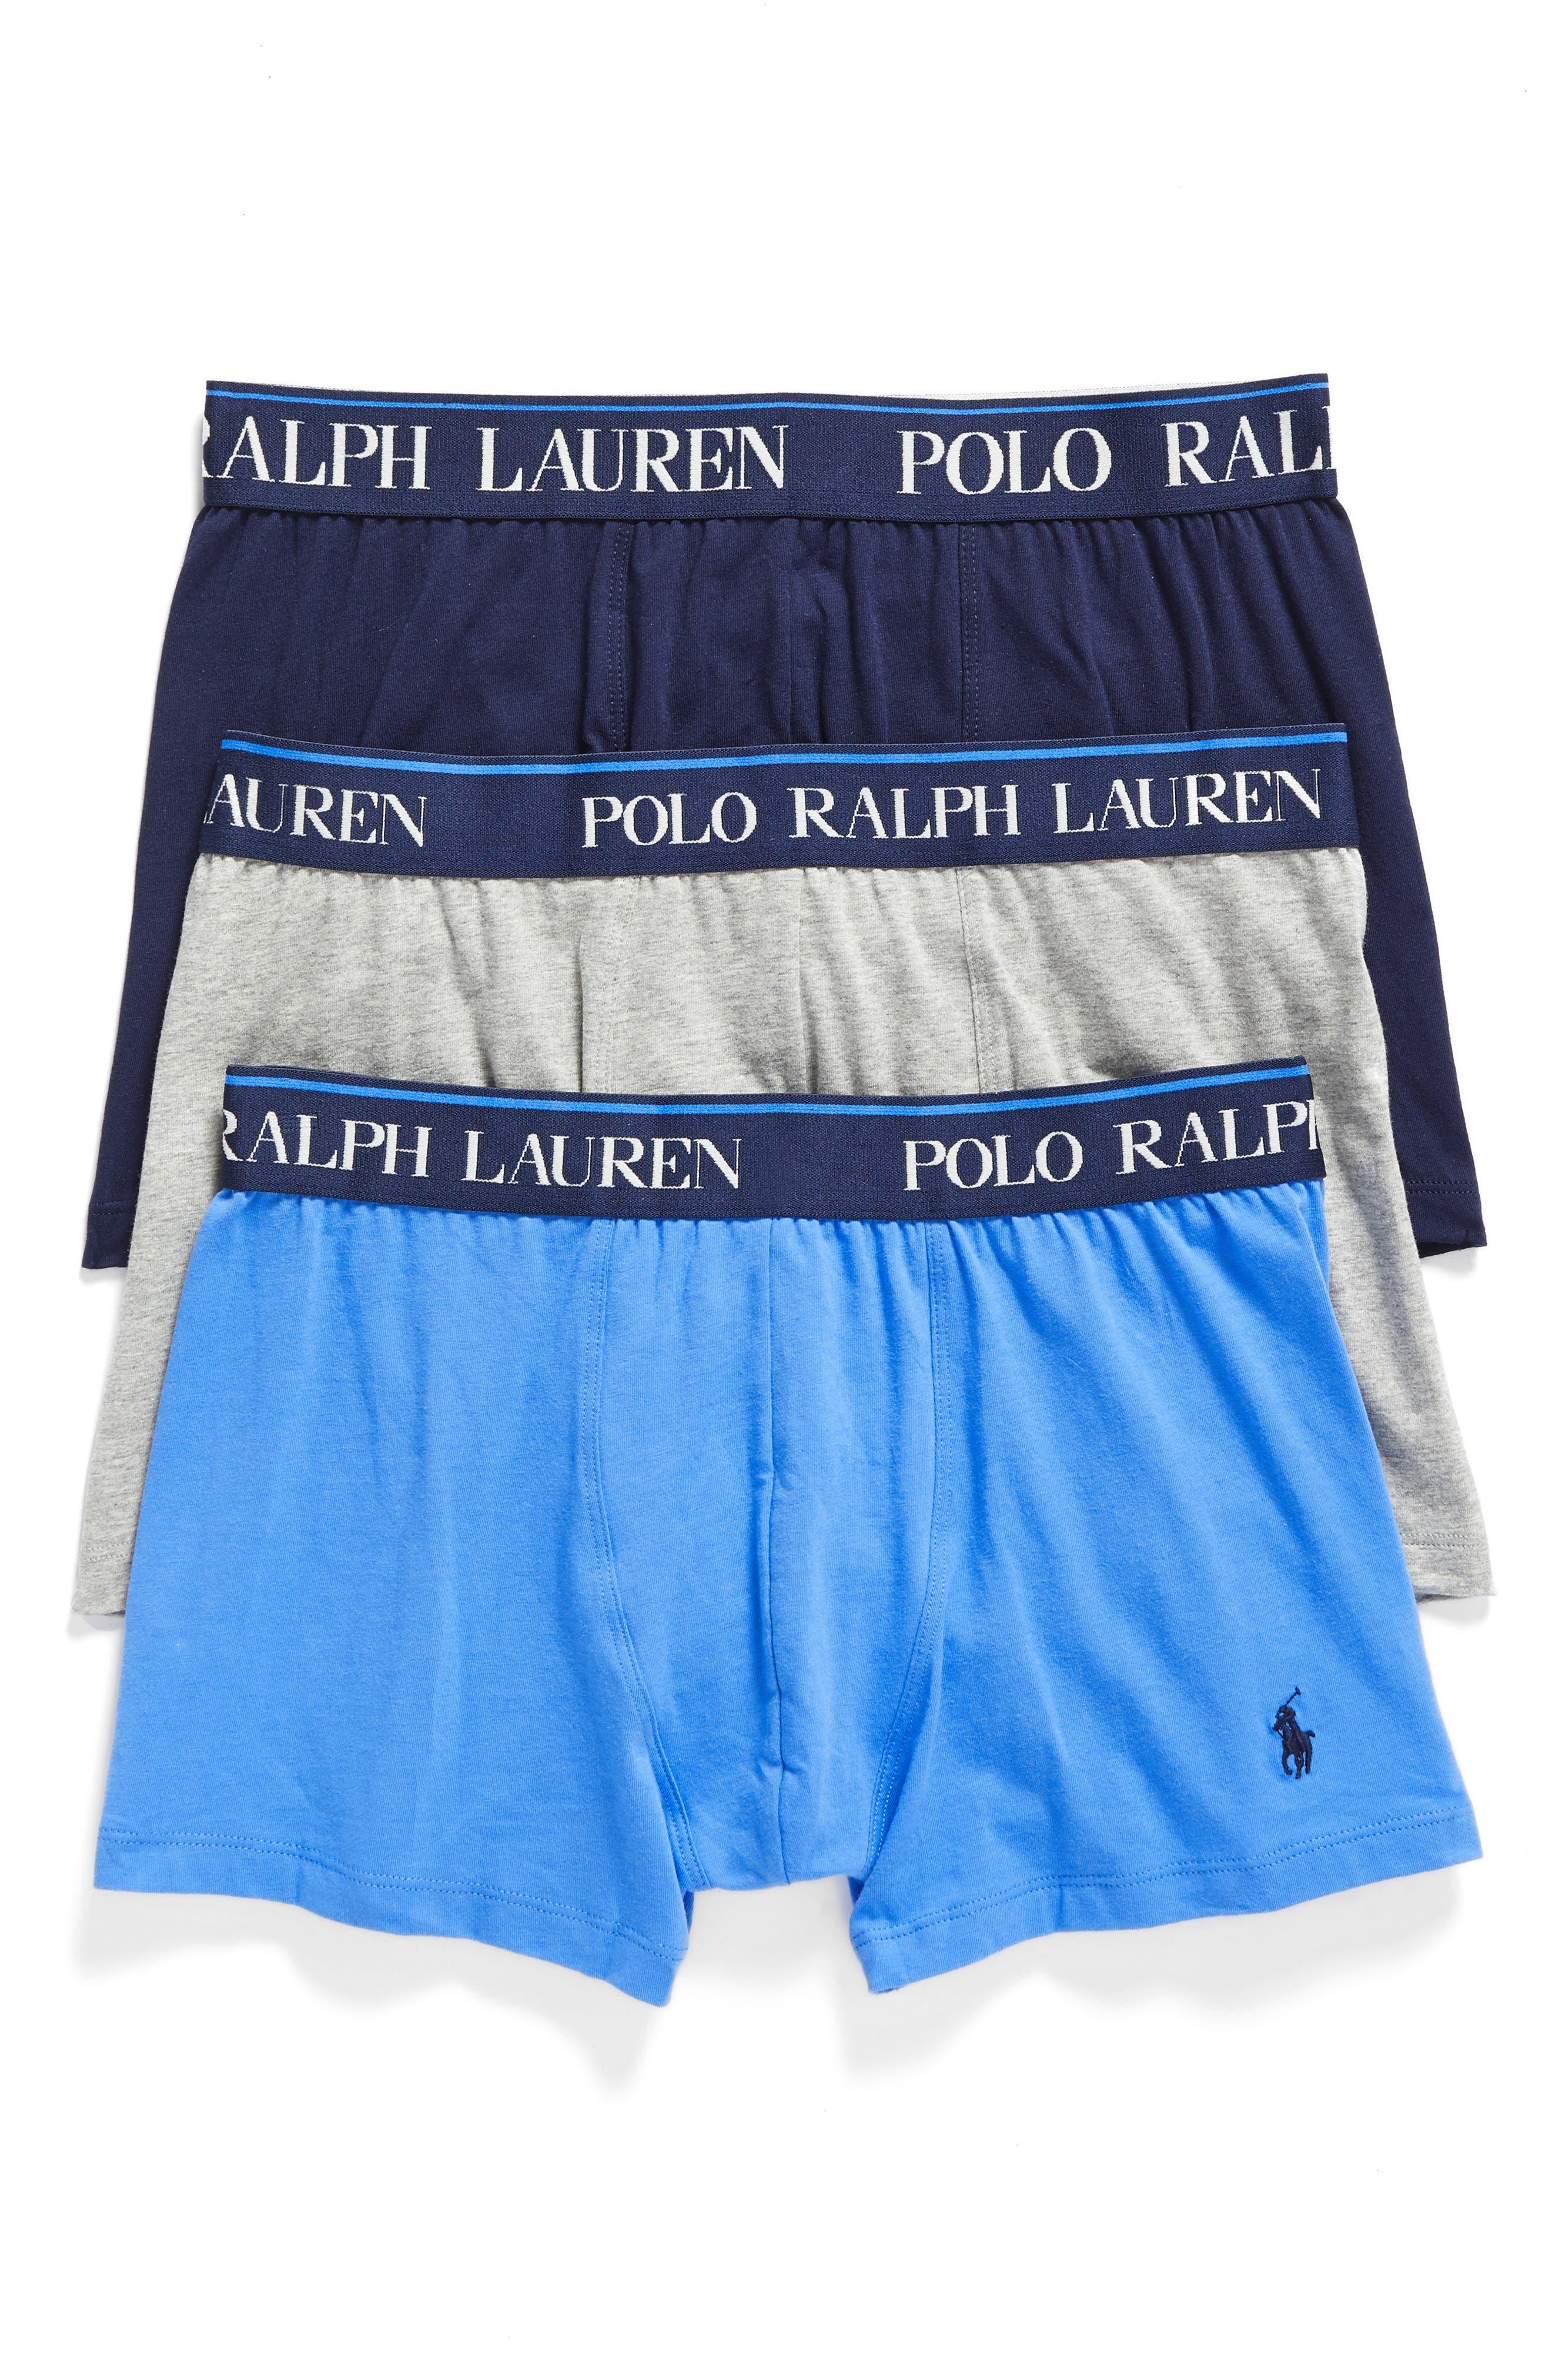 Polo Ralph Lauren 3-Pack Stretch Cotton Boxer Briefs